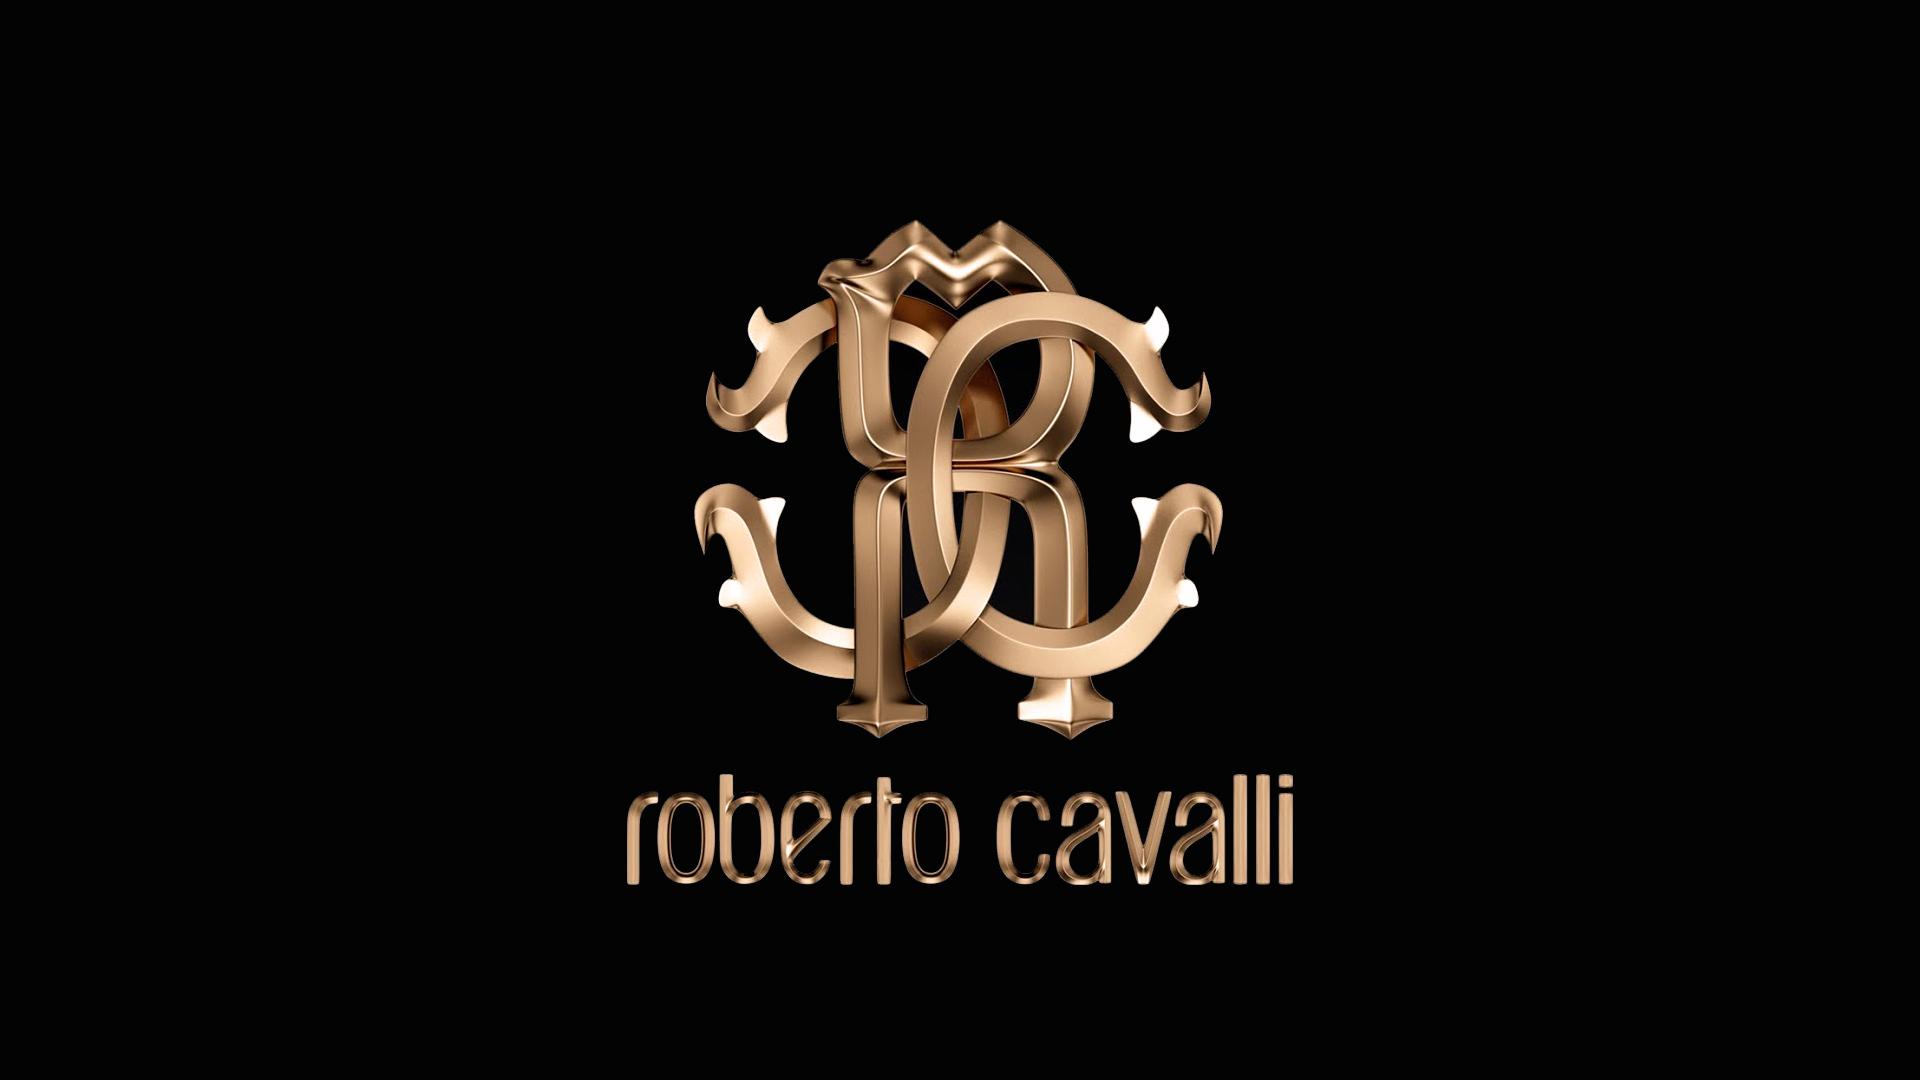 Luxury Roberto Cavalli Brand Gold Logo On The Wallpaper